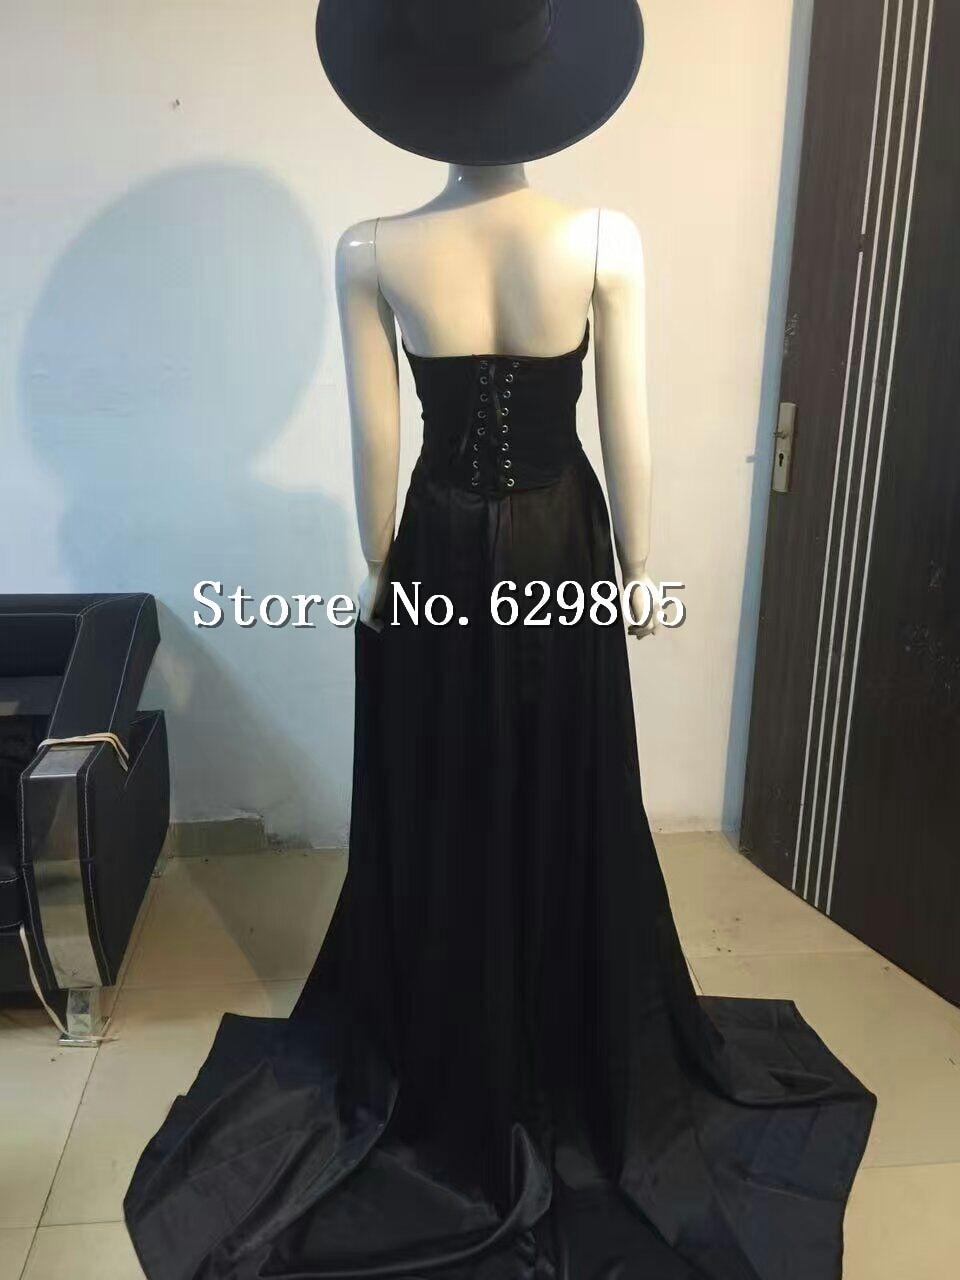 Black Long Skirt Girly Dj Ds Female Singer Costumes Big Full Dress Formal Dress Clothing Set Performance Nightclub Dance Wear